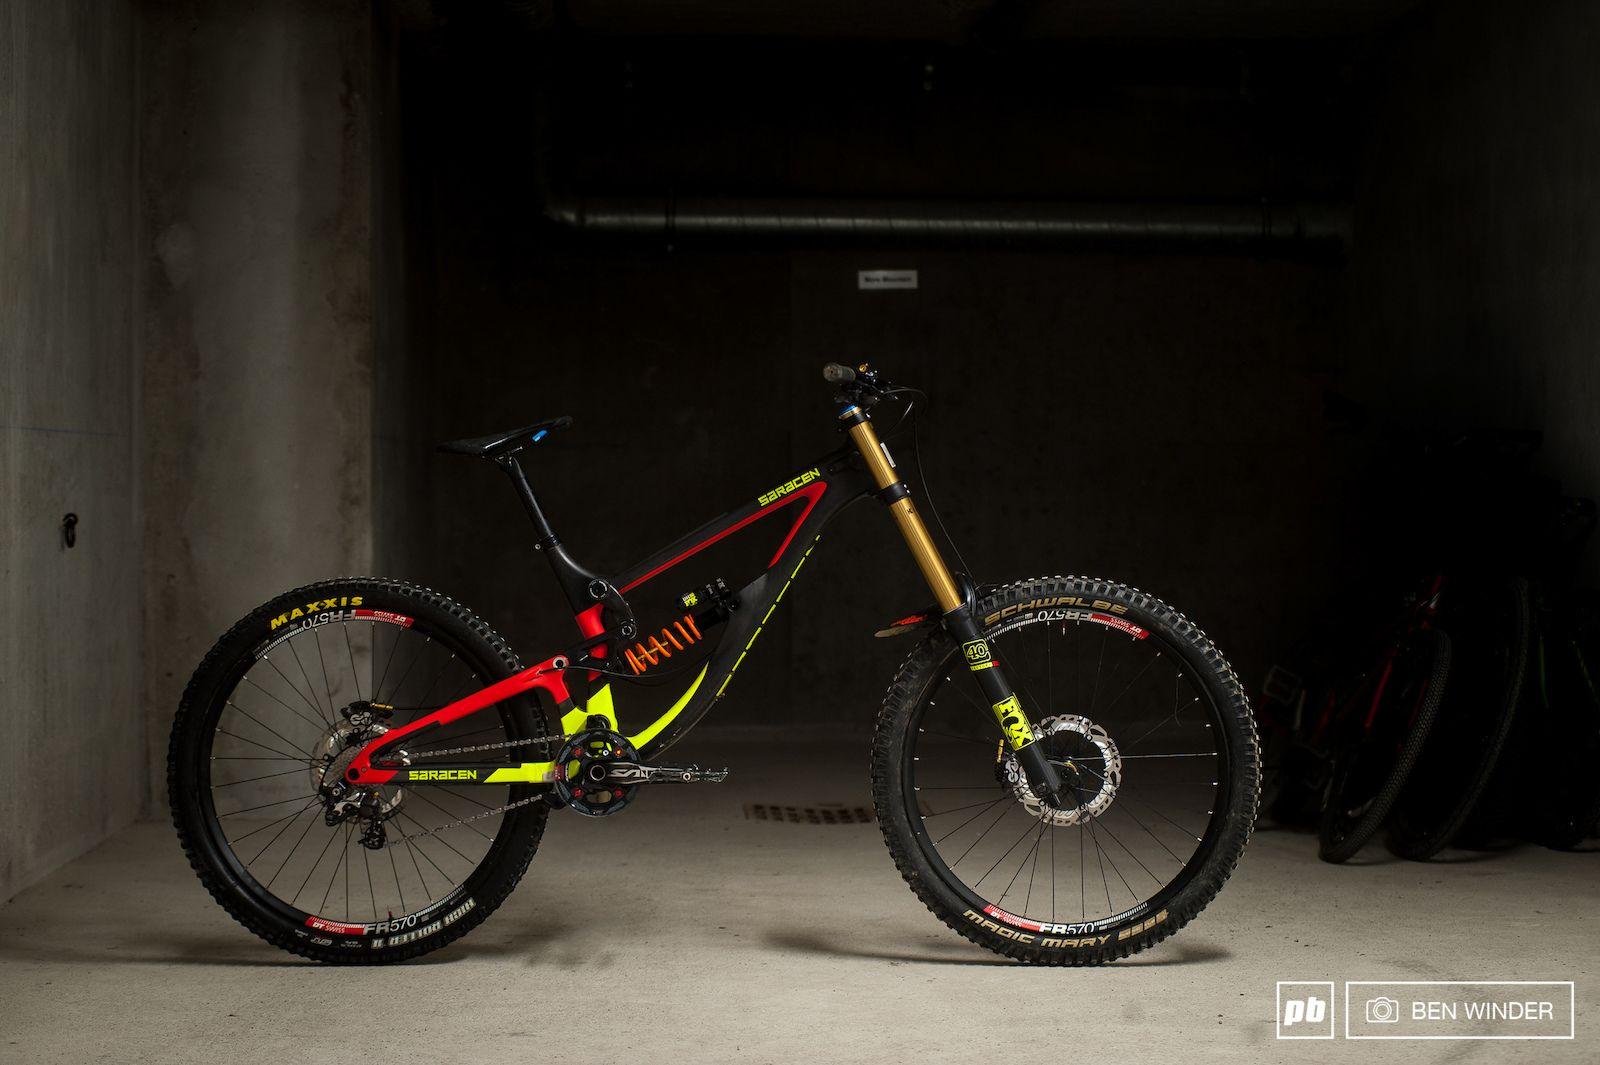 Saracen Myst Team Carbon Review Downhill Bike Pink Bike Bike